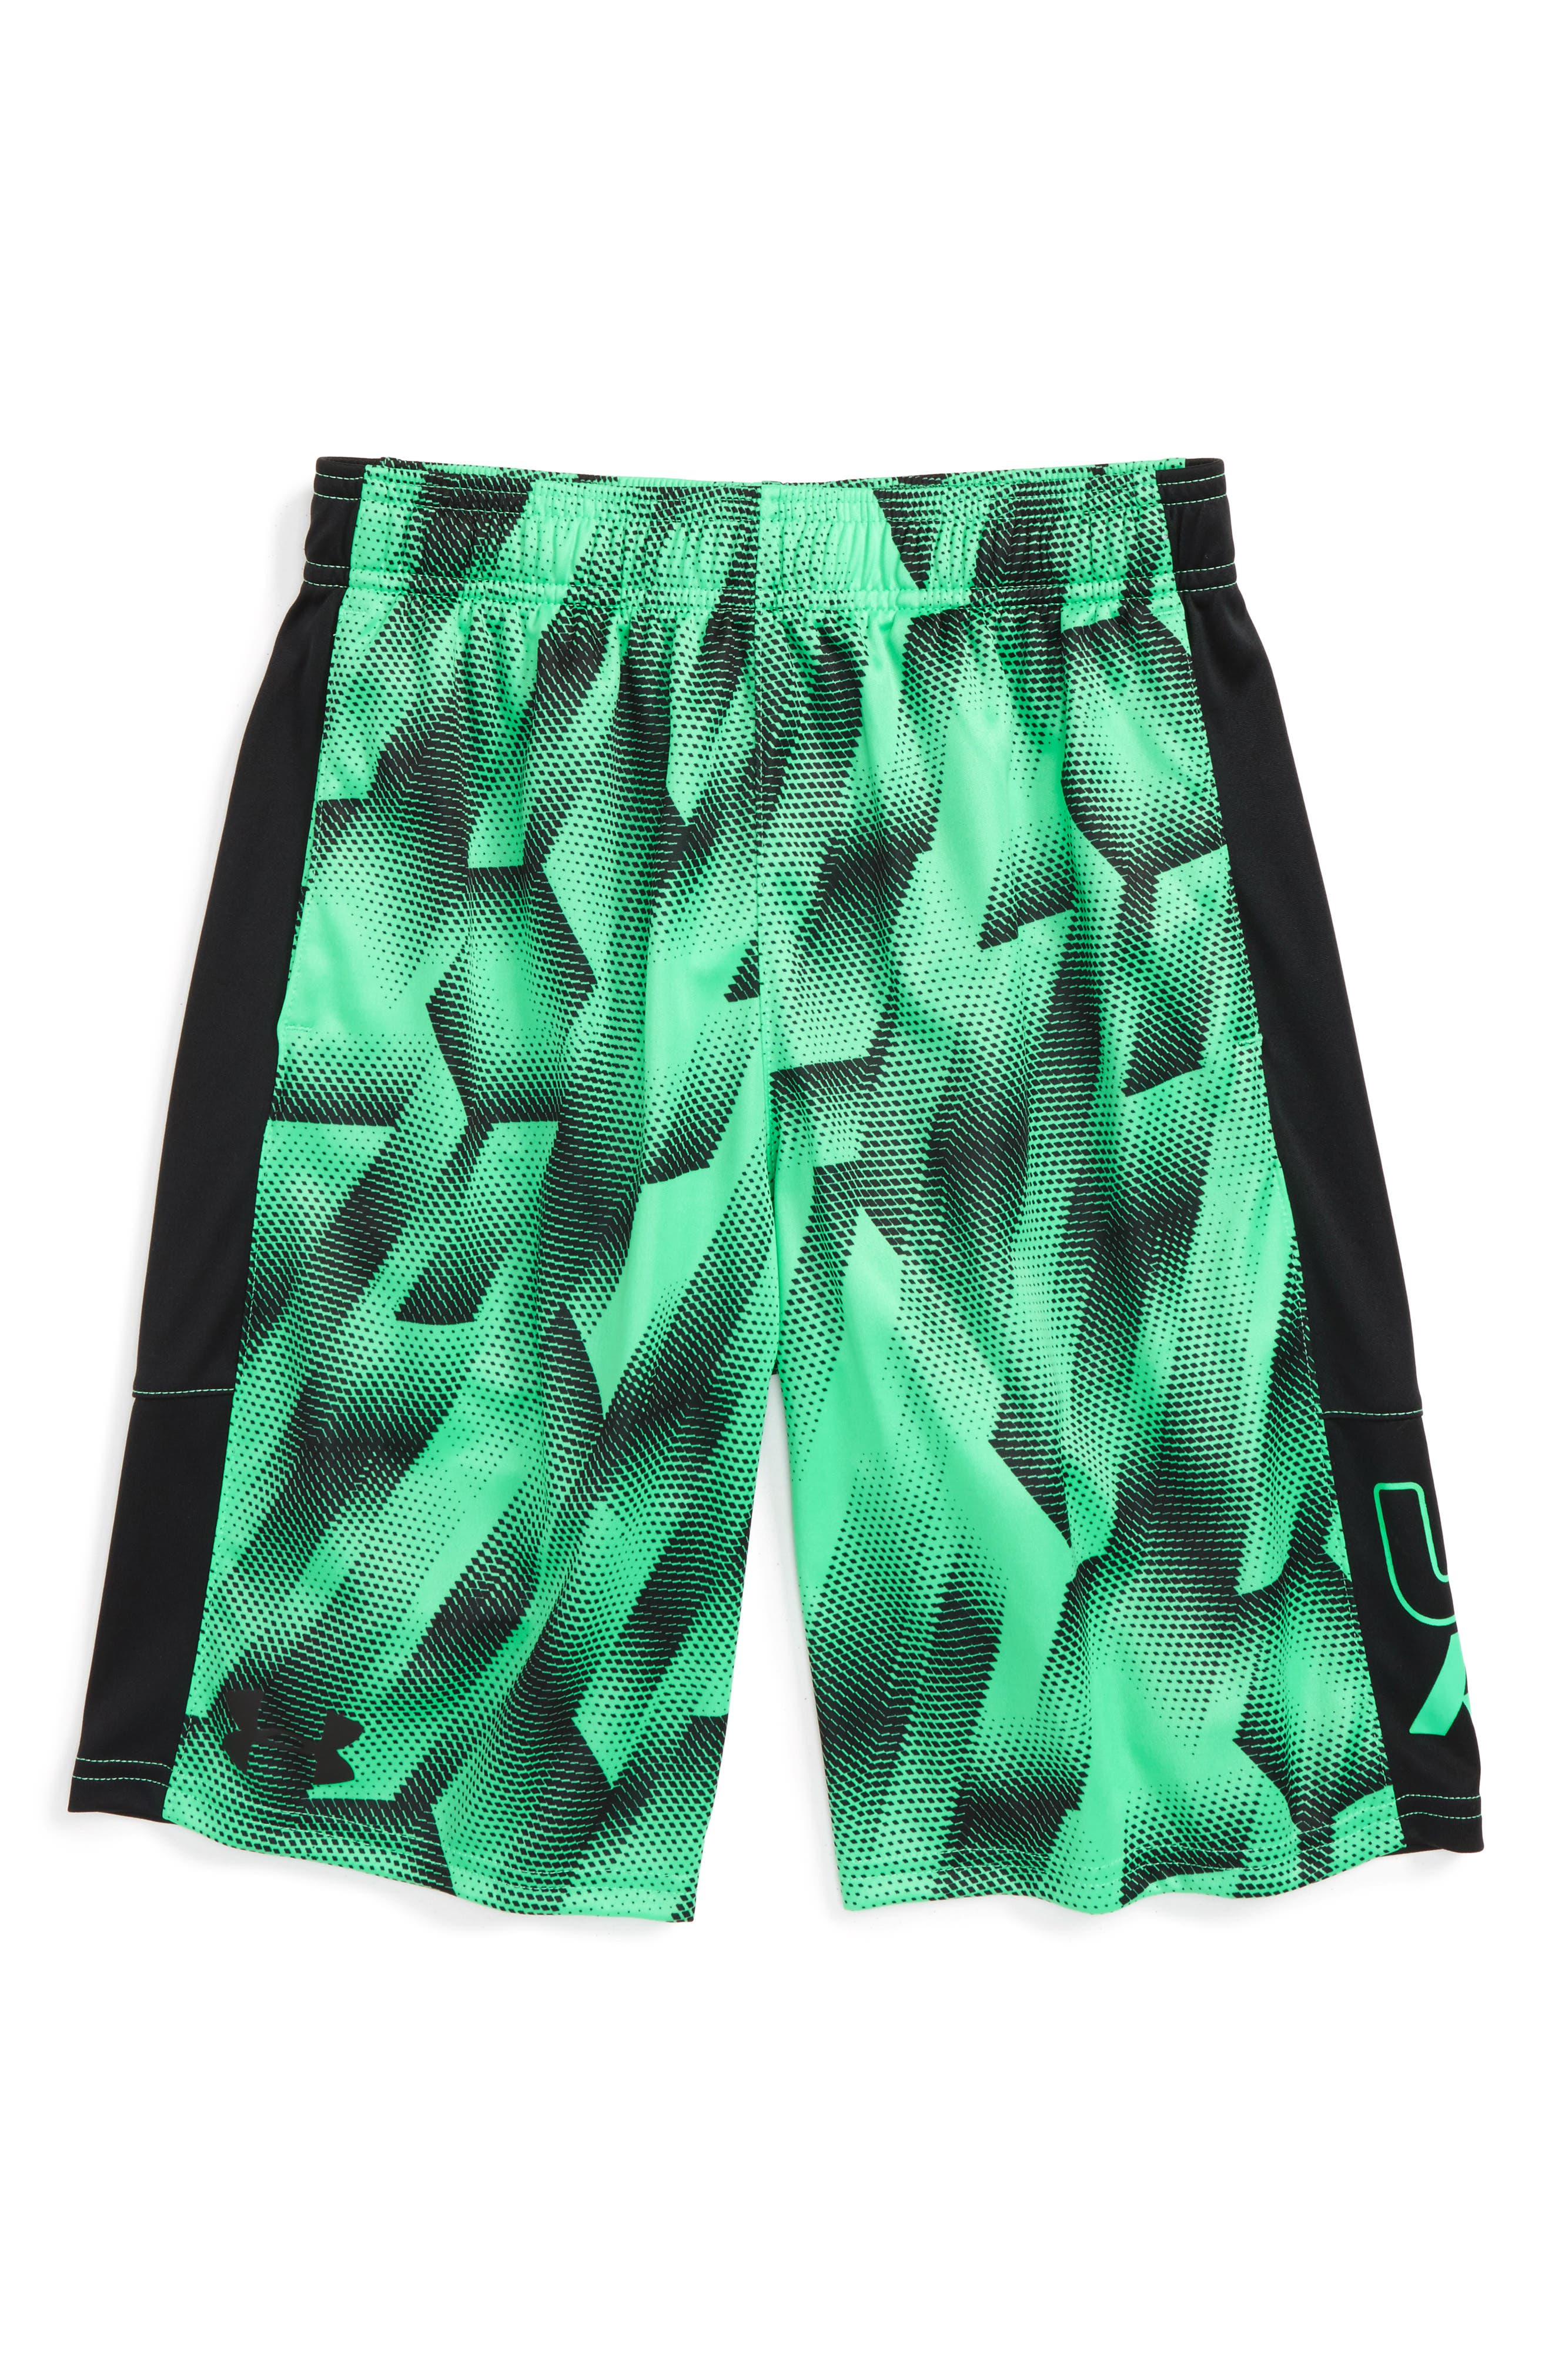 UNDER ARMOUR Stunt HeatGear® Shorts